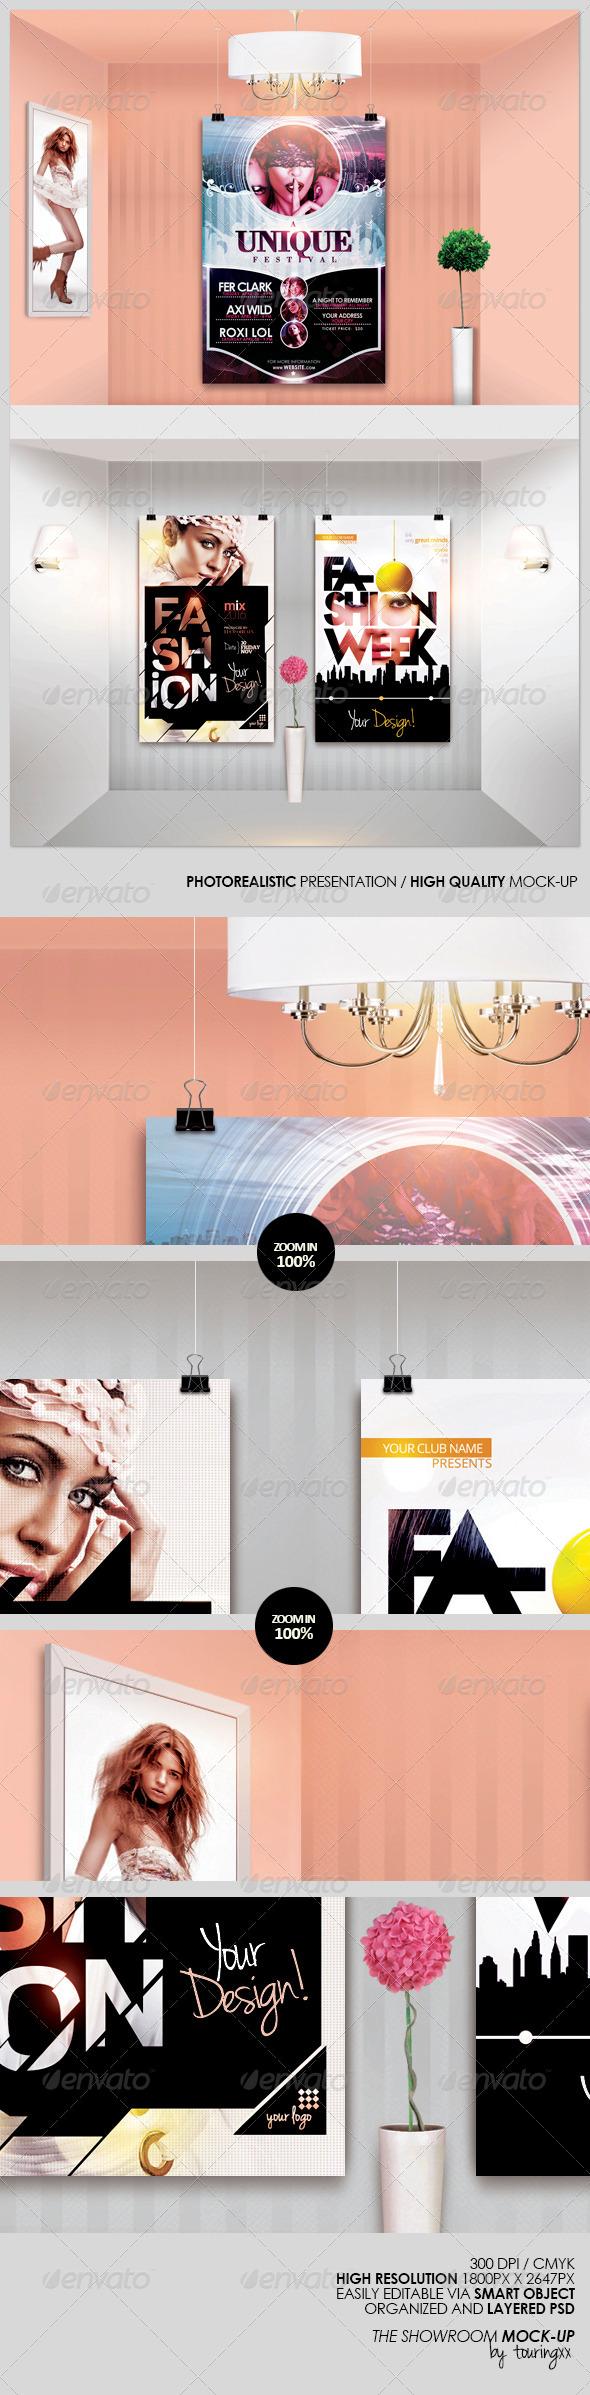 The Showroom Mock-Up - Product Mock-Ups Graphics